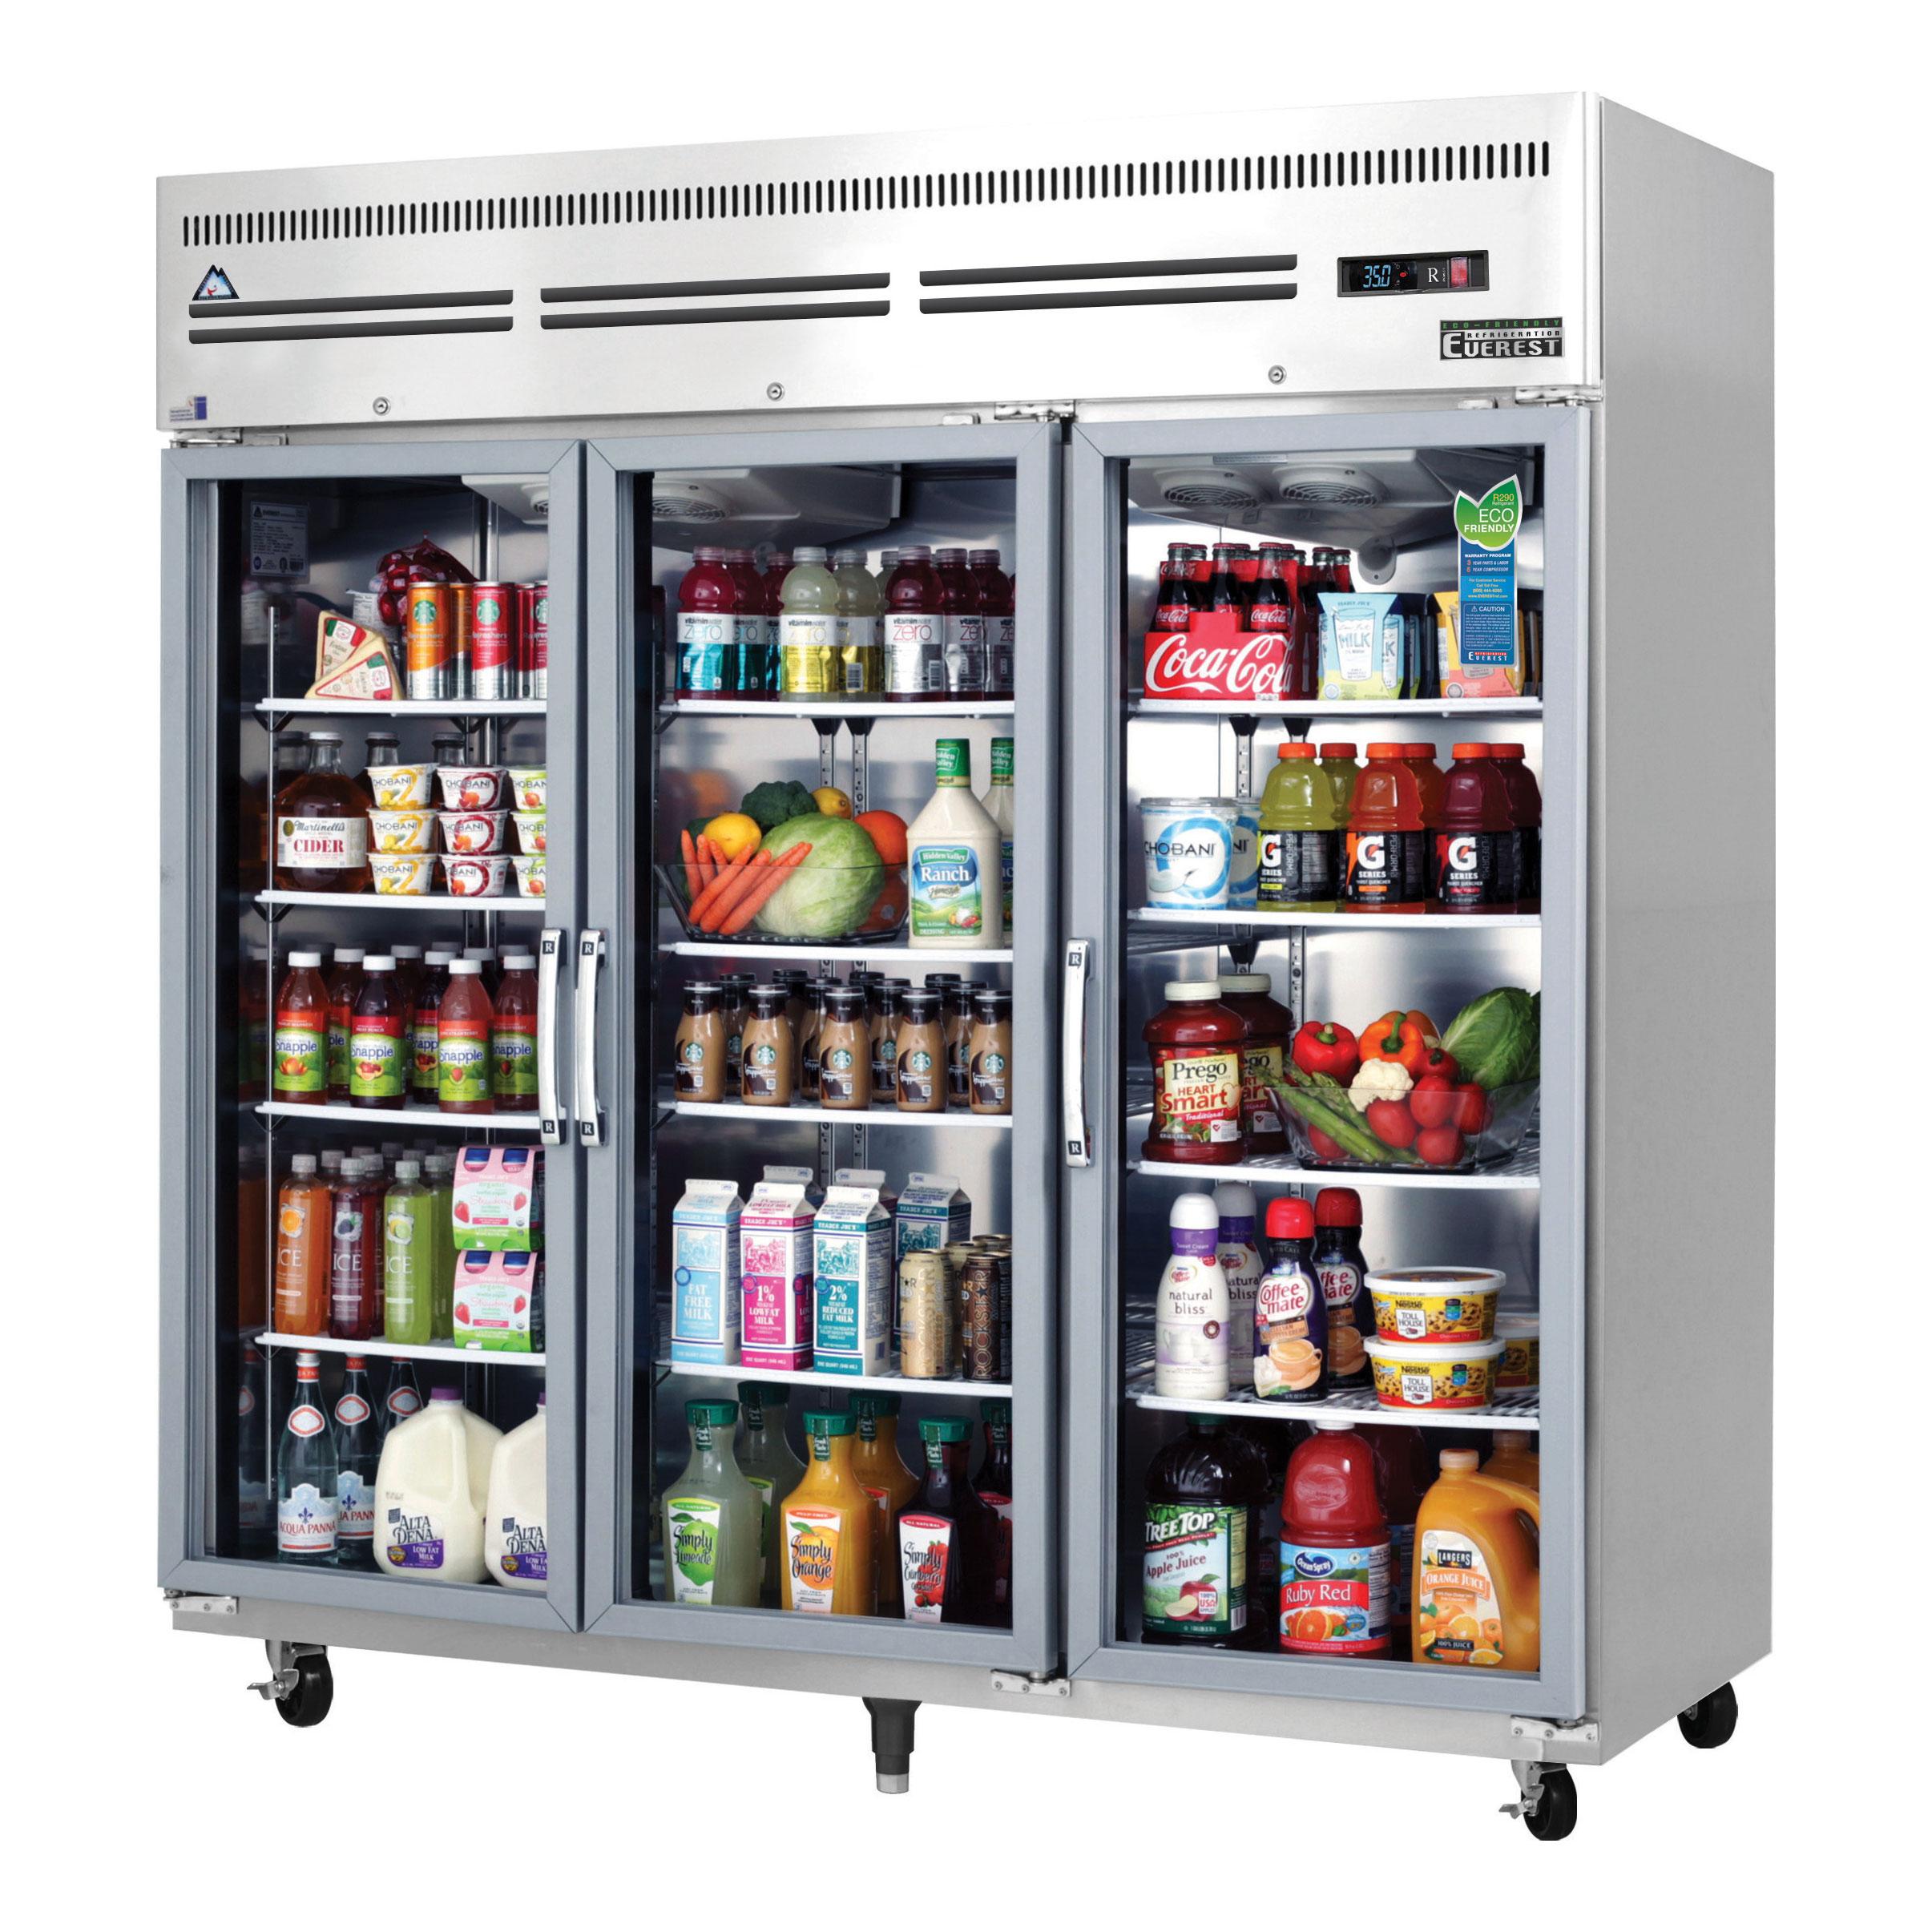 Everest Refrigeration ESGR3A refrigerator, reach-in